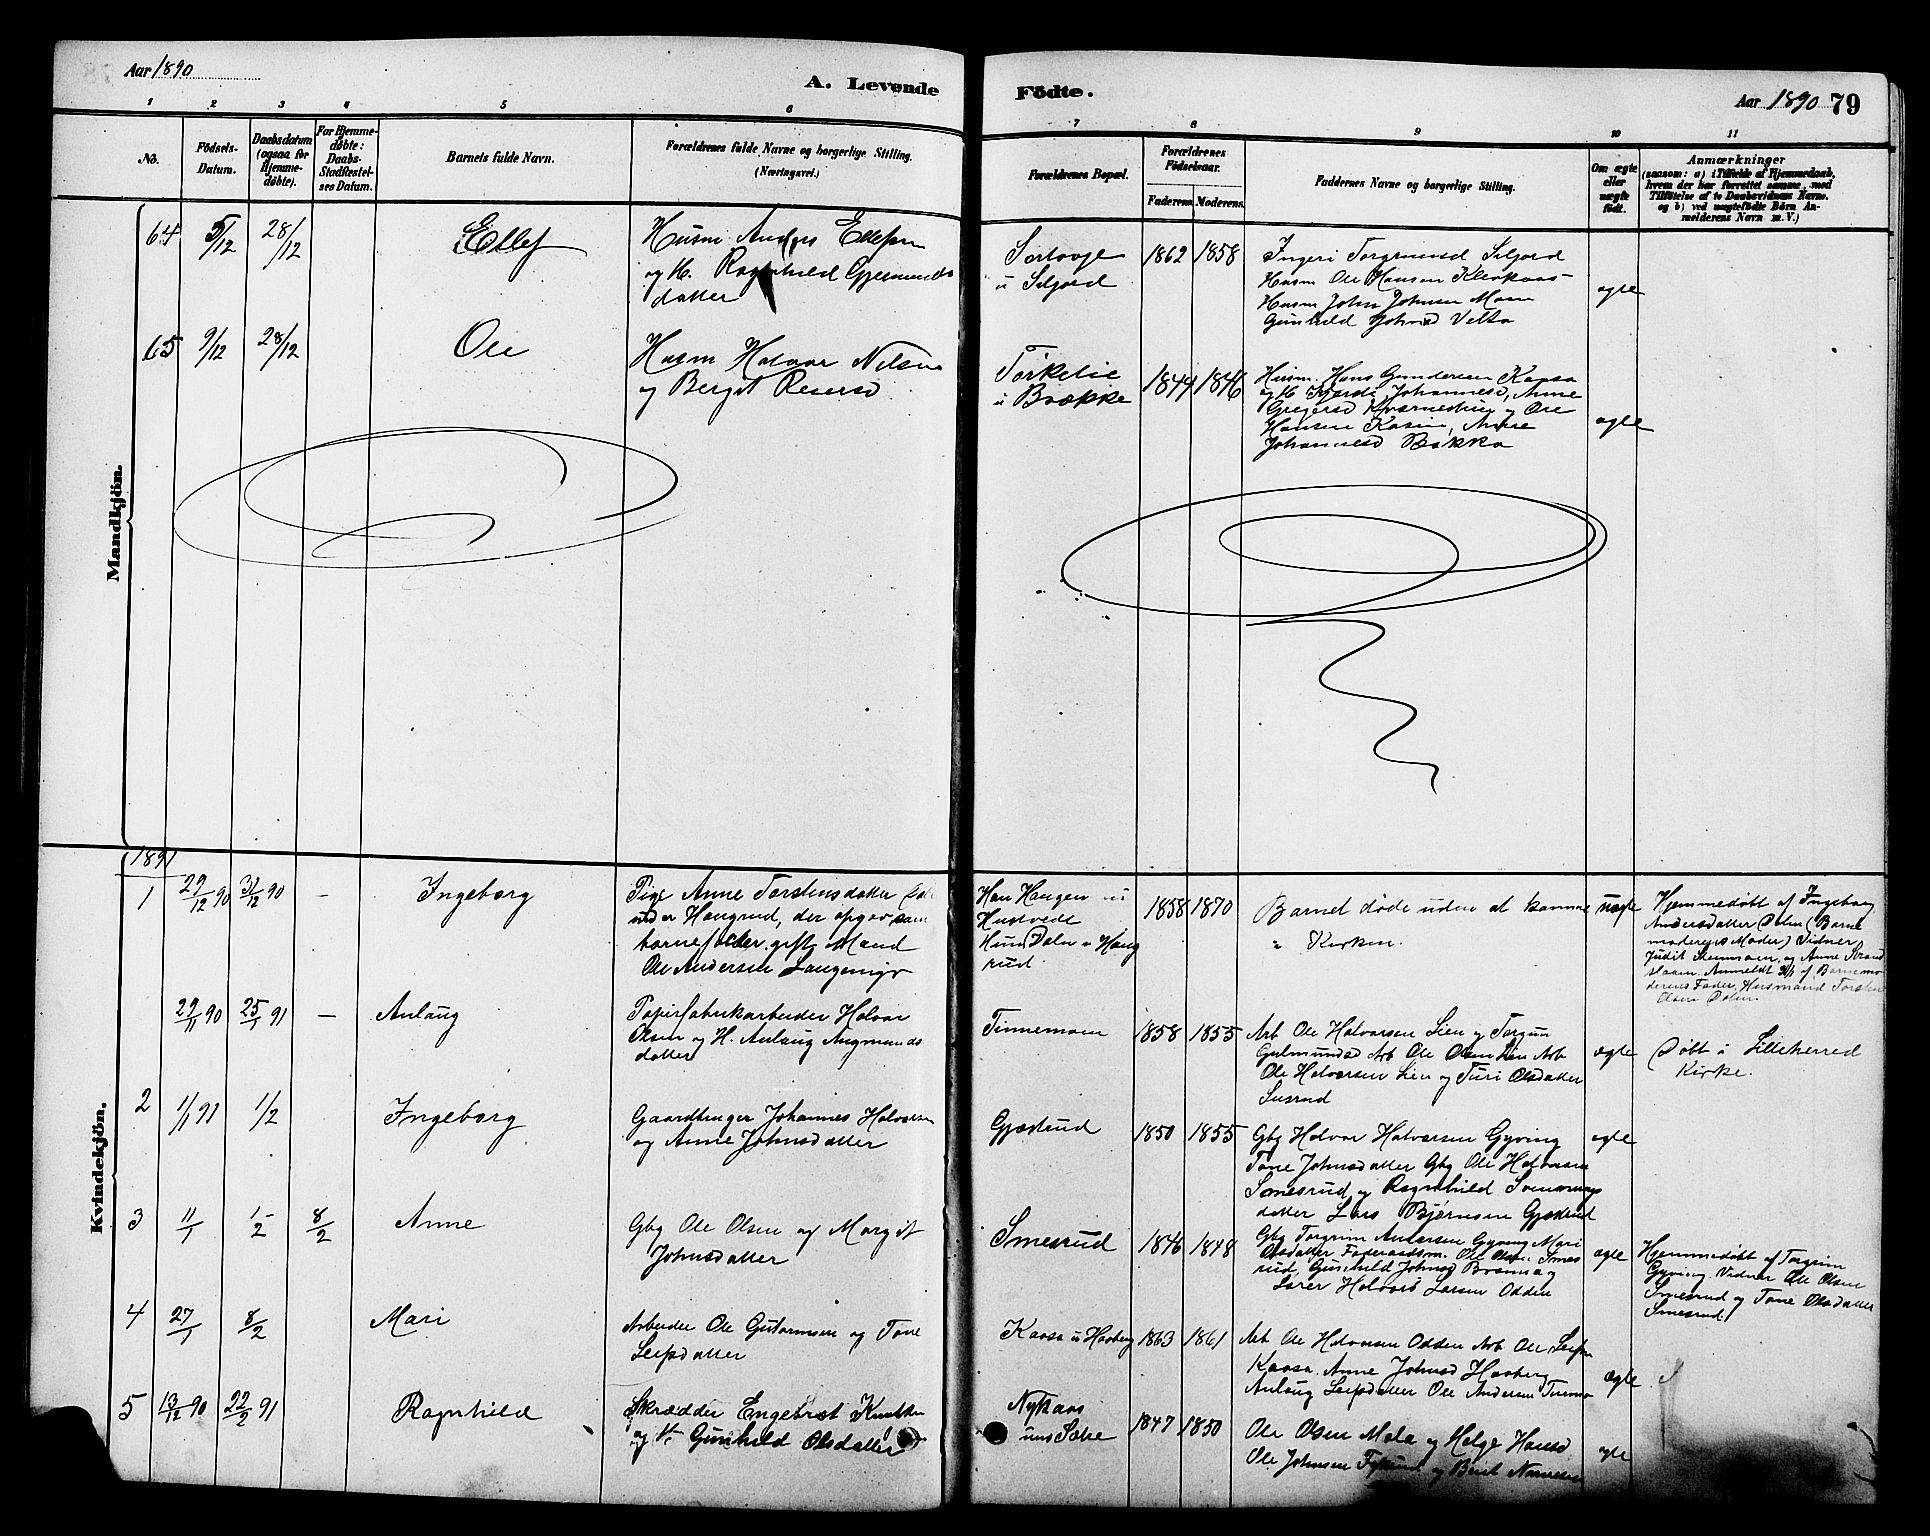 SAKO, Heddal kirkebøker, G/Ga/L0002: Klokkerbok nr. I 2, 1879-1908, s. 79